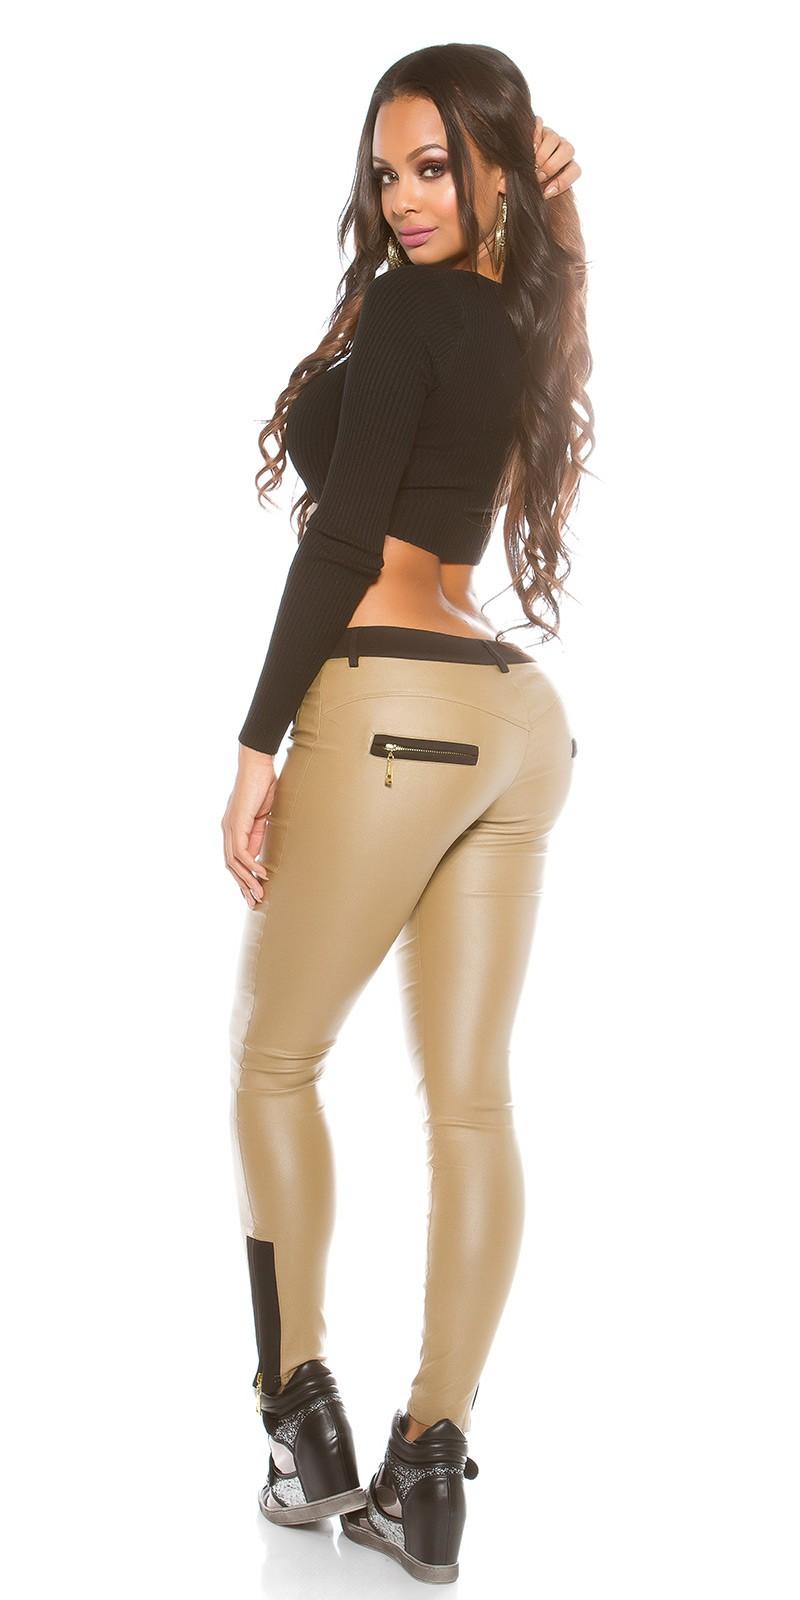 e6ae6c6d1b NŐI RUHA   Bőrhatású női nadrág fekete betétekkel - (M-XL ...